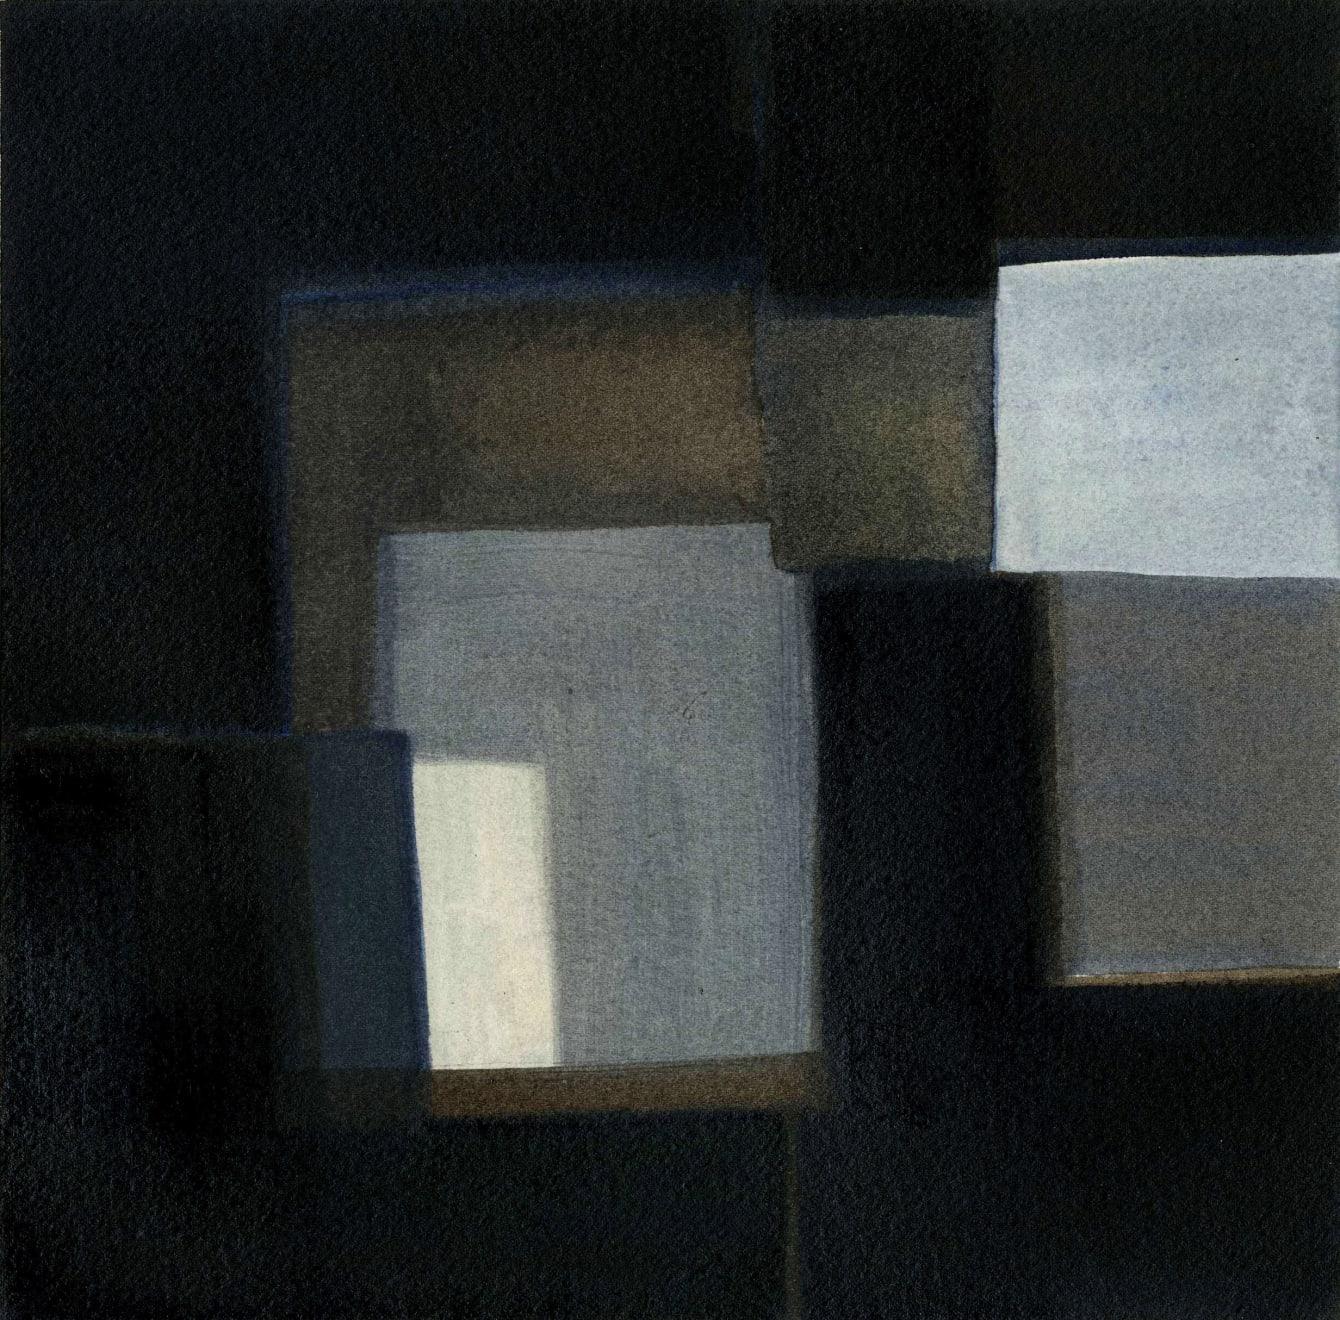 Summer Auction 2020, LOT 117 - Tooney Phillips - 'Extract III', 2019